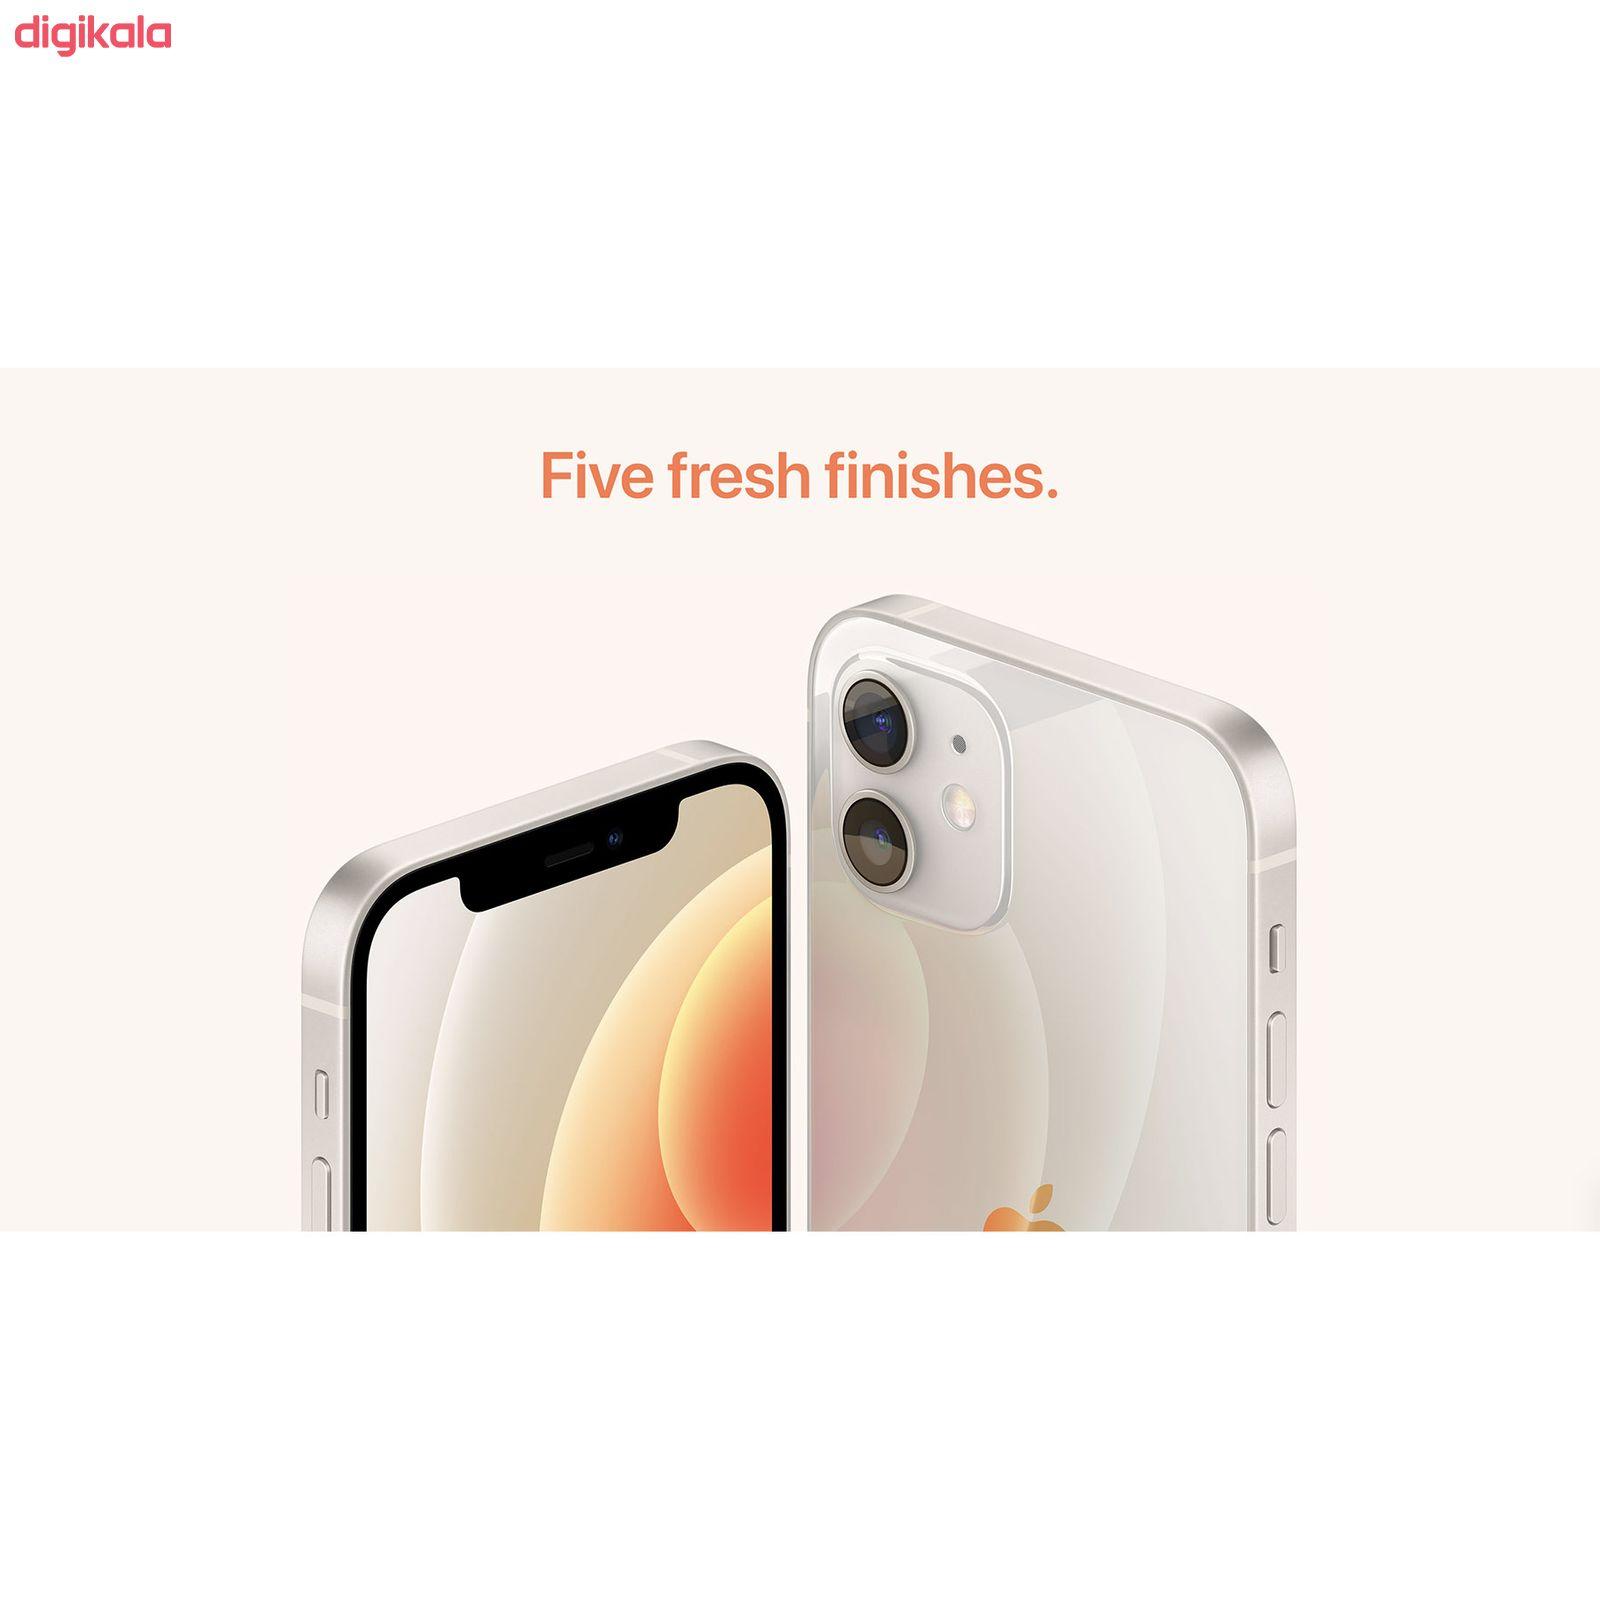 گوشی موبایل اپل مدل iPhone 12 A2404 دو سیم کارت ظرفیت 128 گیگابایت  main 1 8